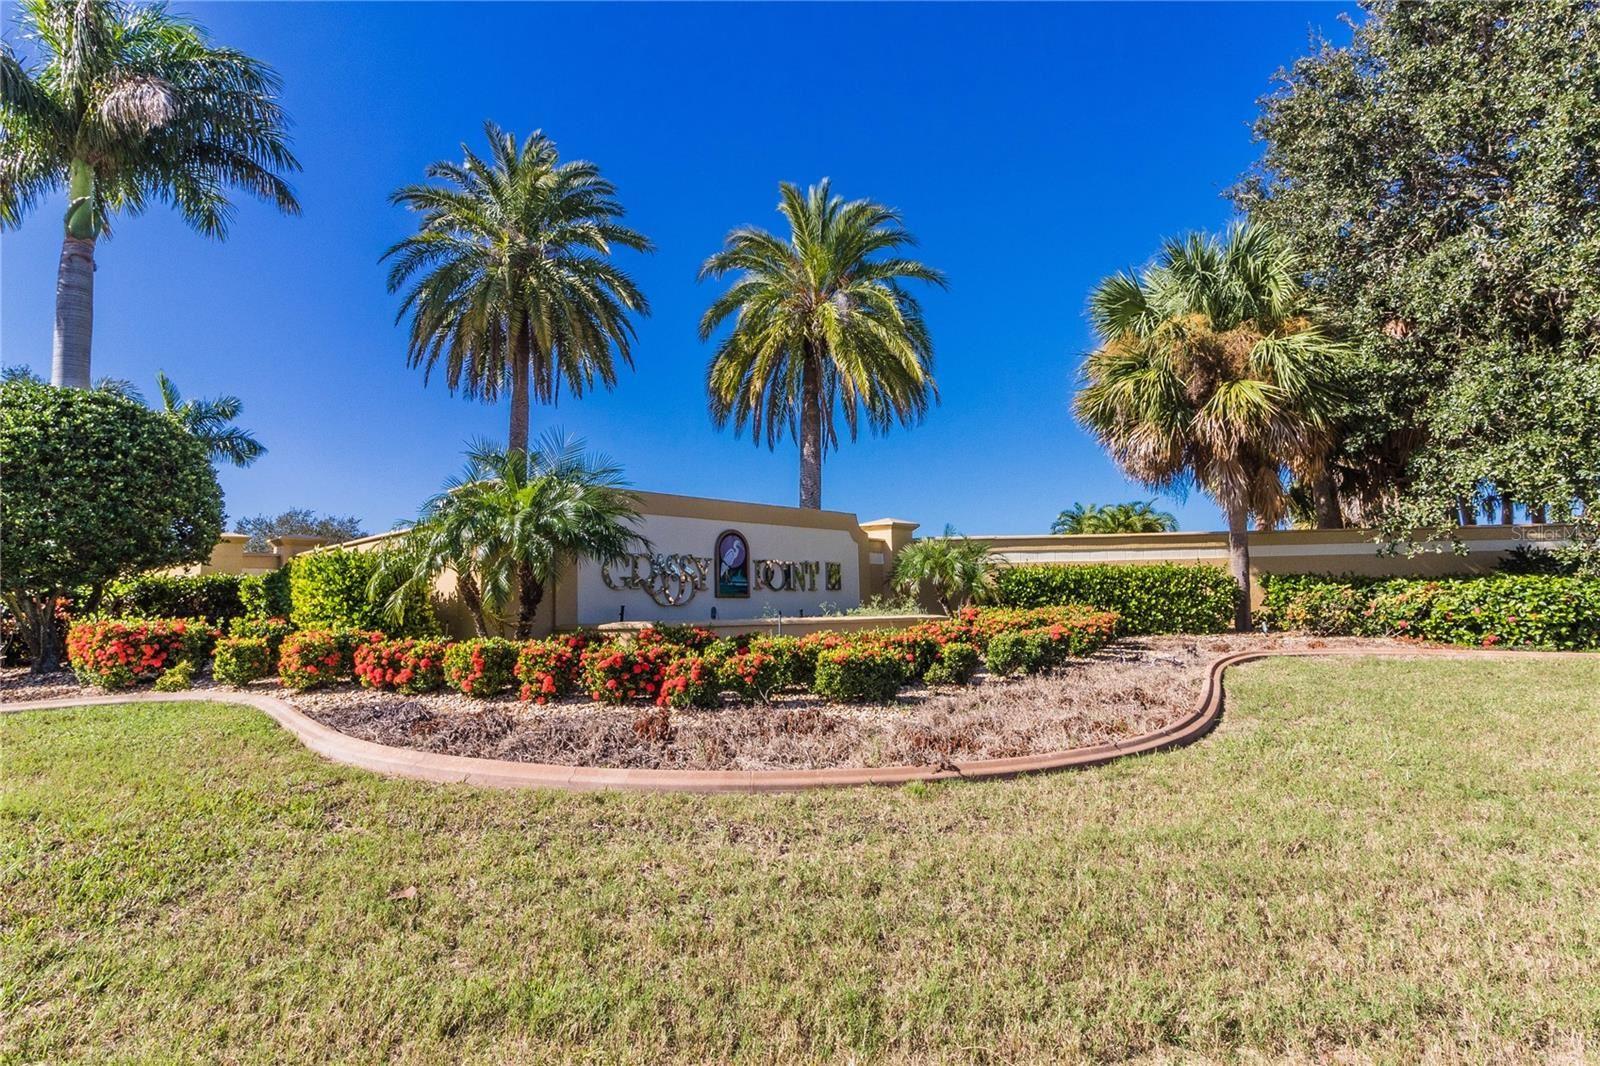 Photo of 4691 GRASSY POINT BOULEVARD, PORT CHARLOTTE, FL 33952 (MLS # C7444274)